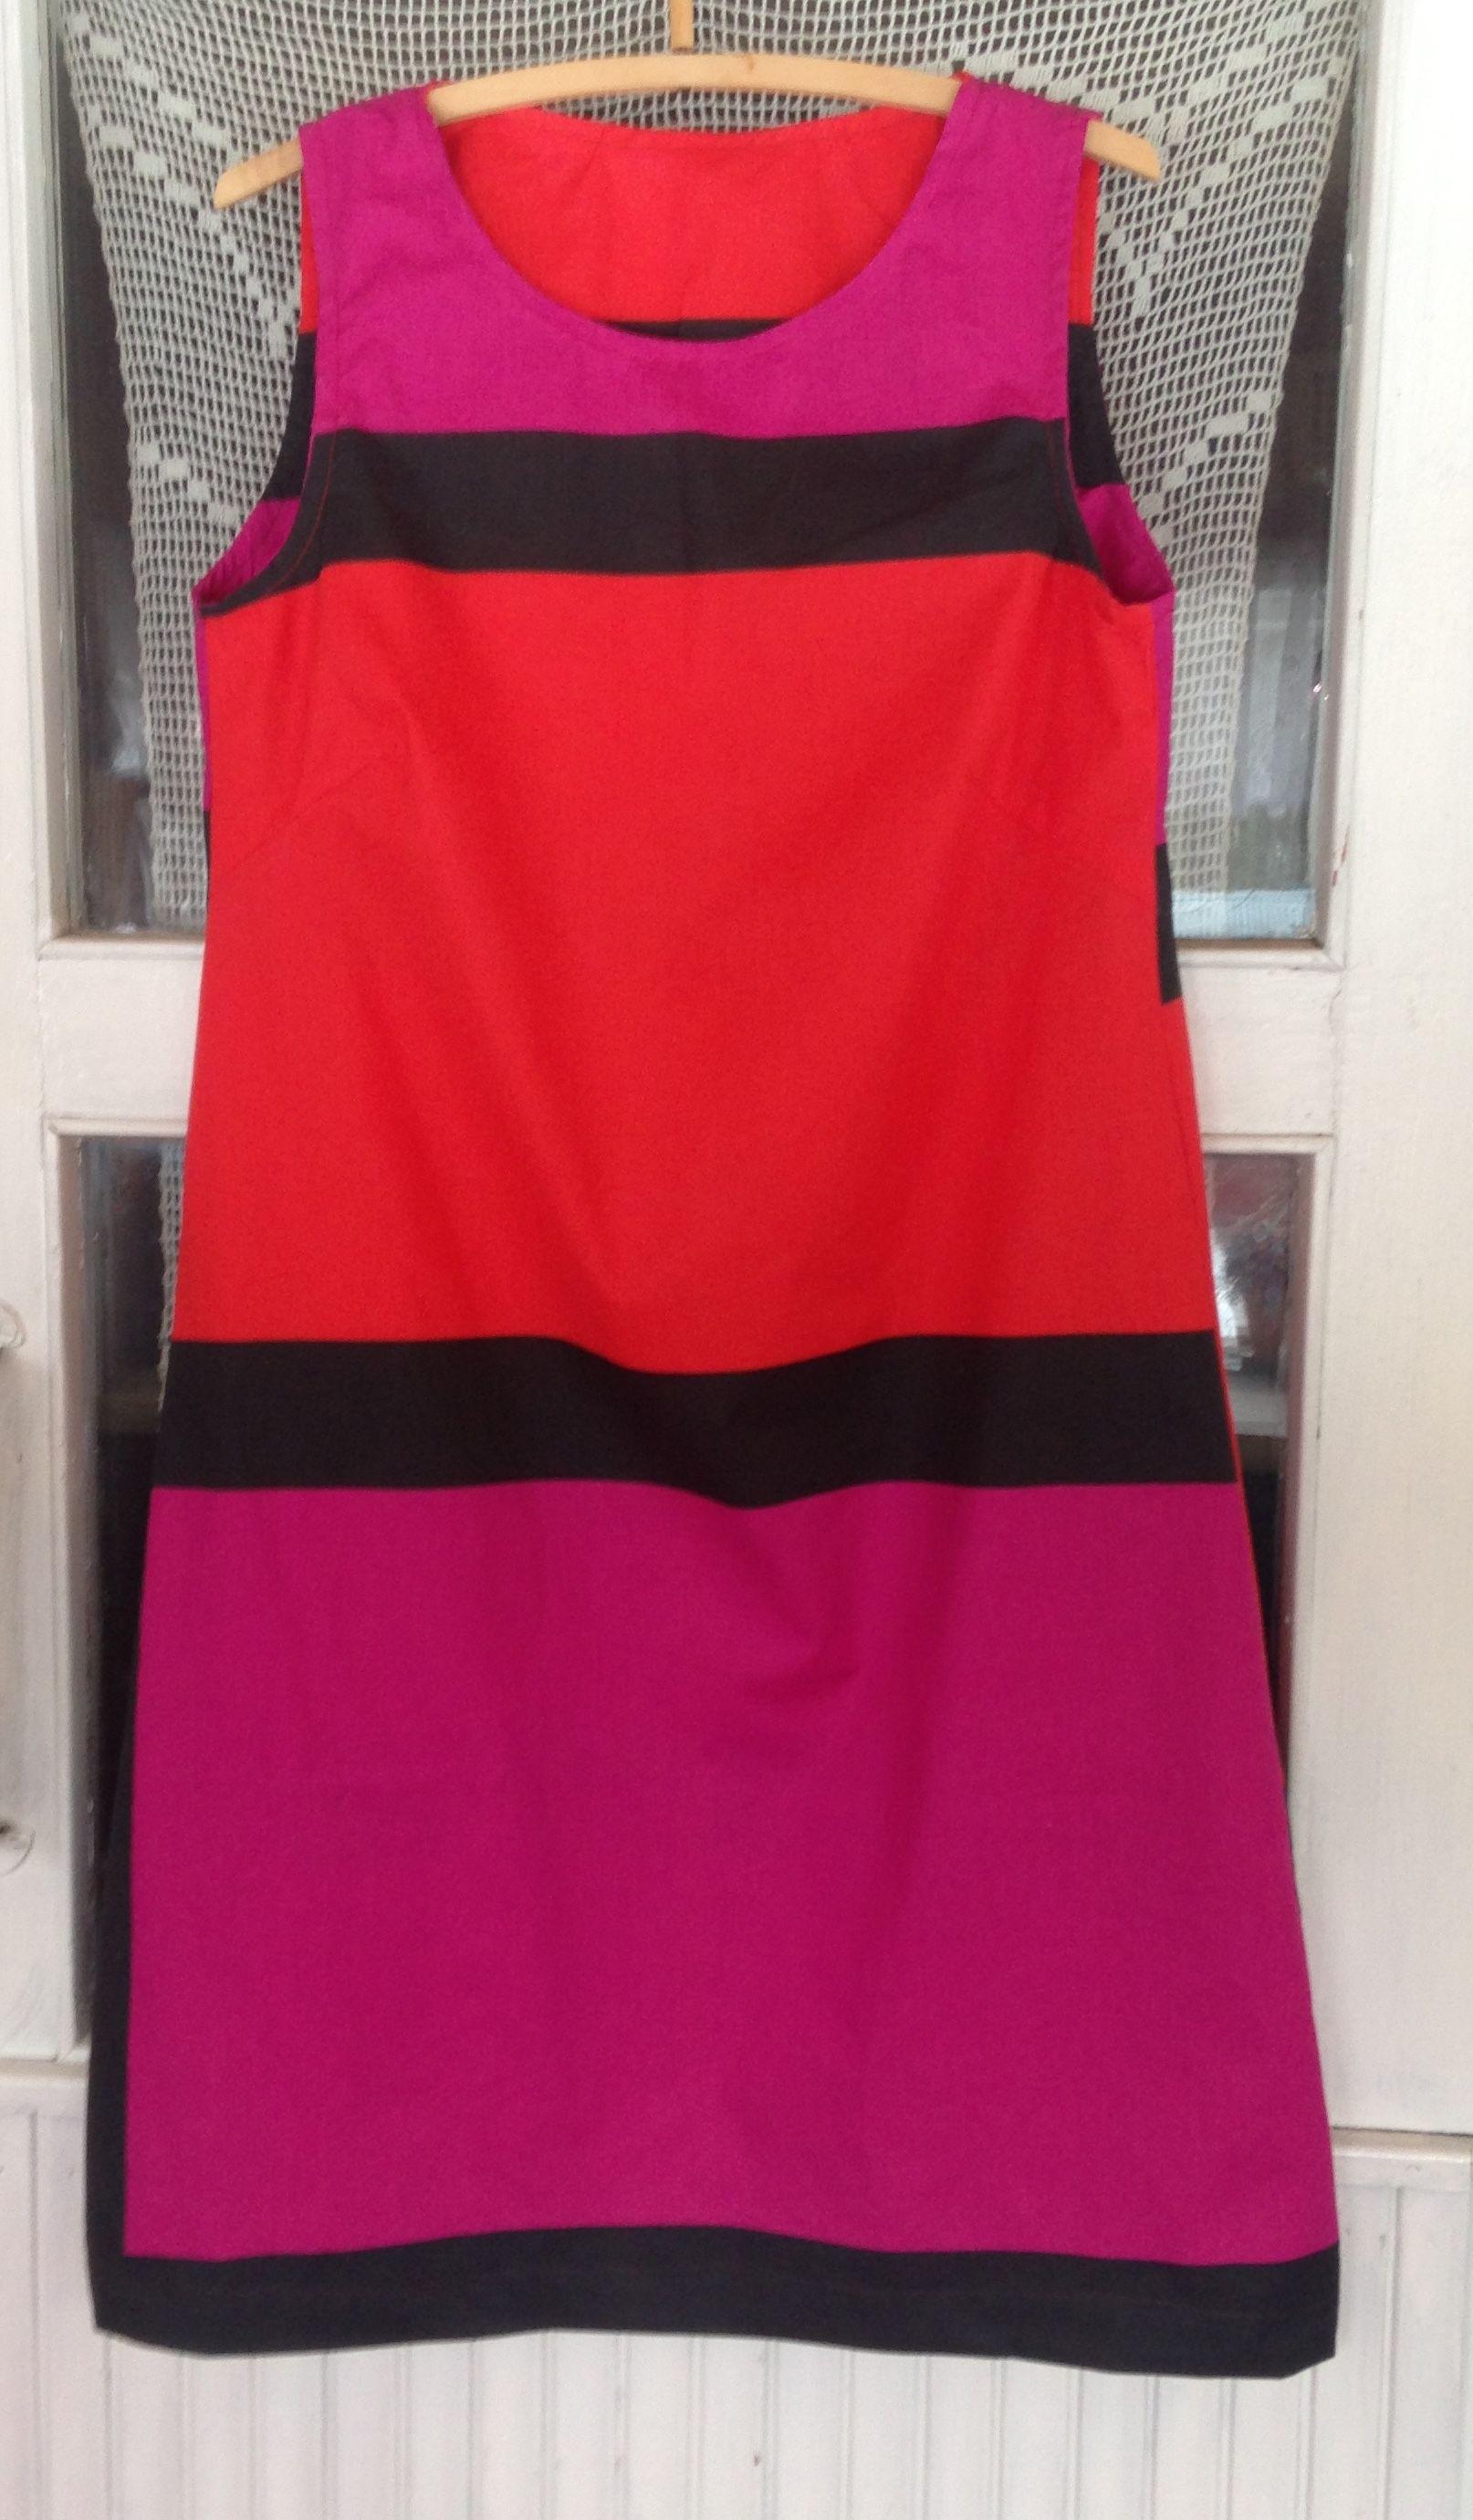 Dresses Itsetehdyt KankaastaHandmade Mekot Tehty Ikean FK1TJ3cl